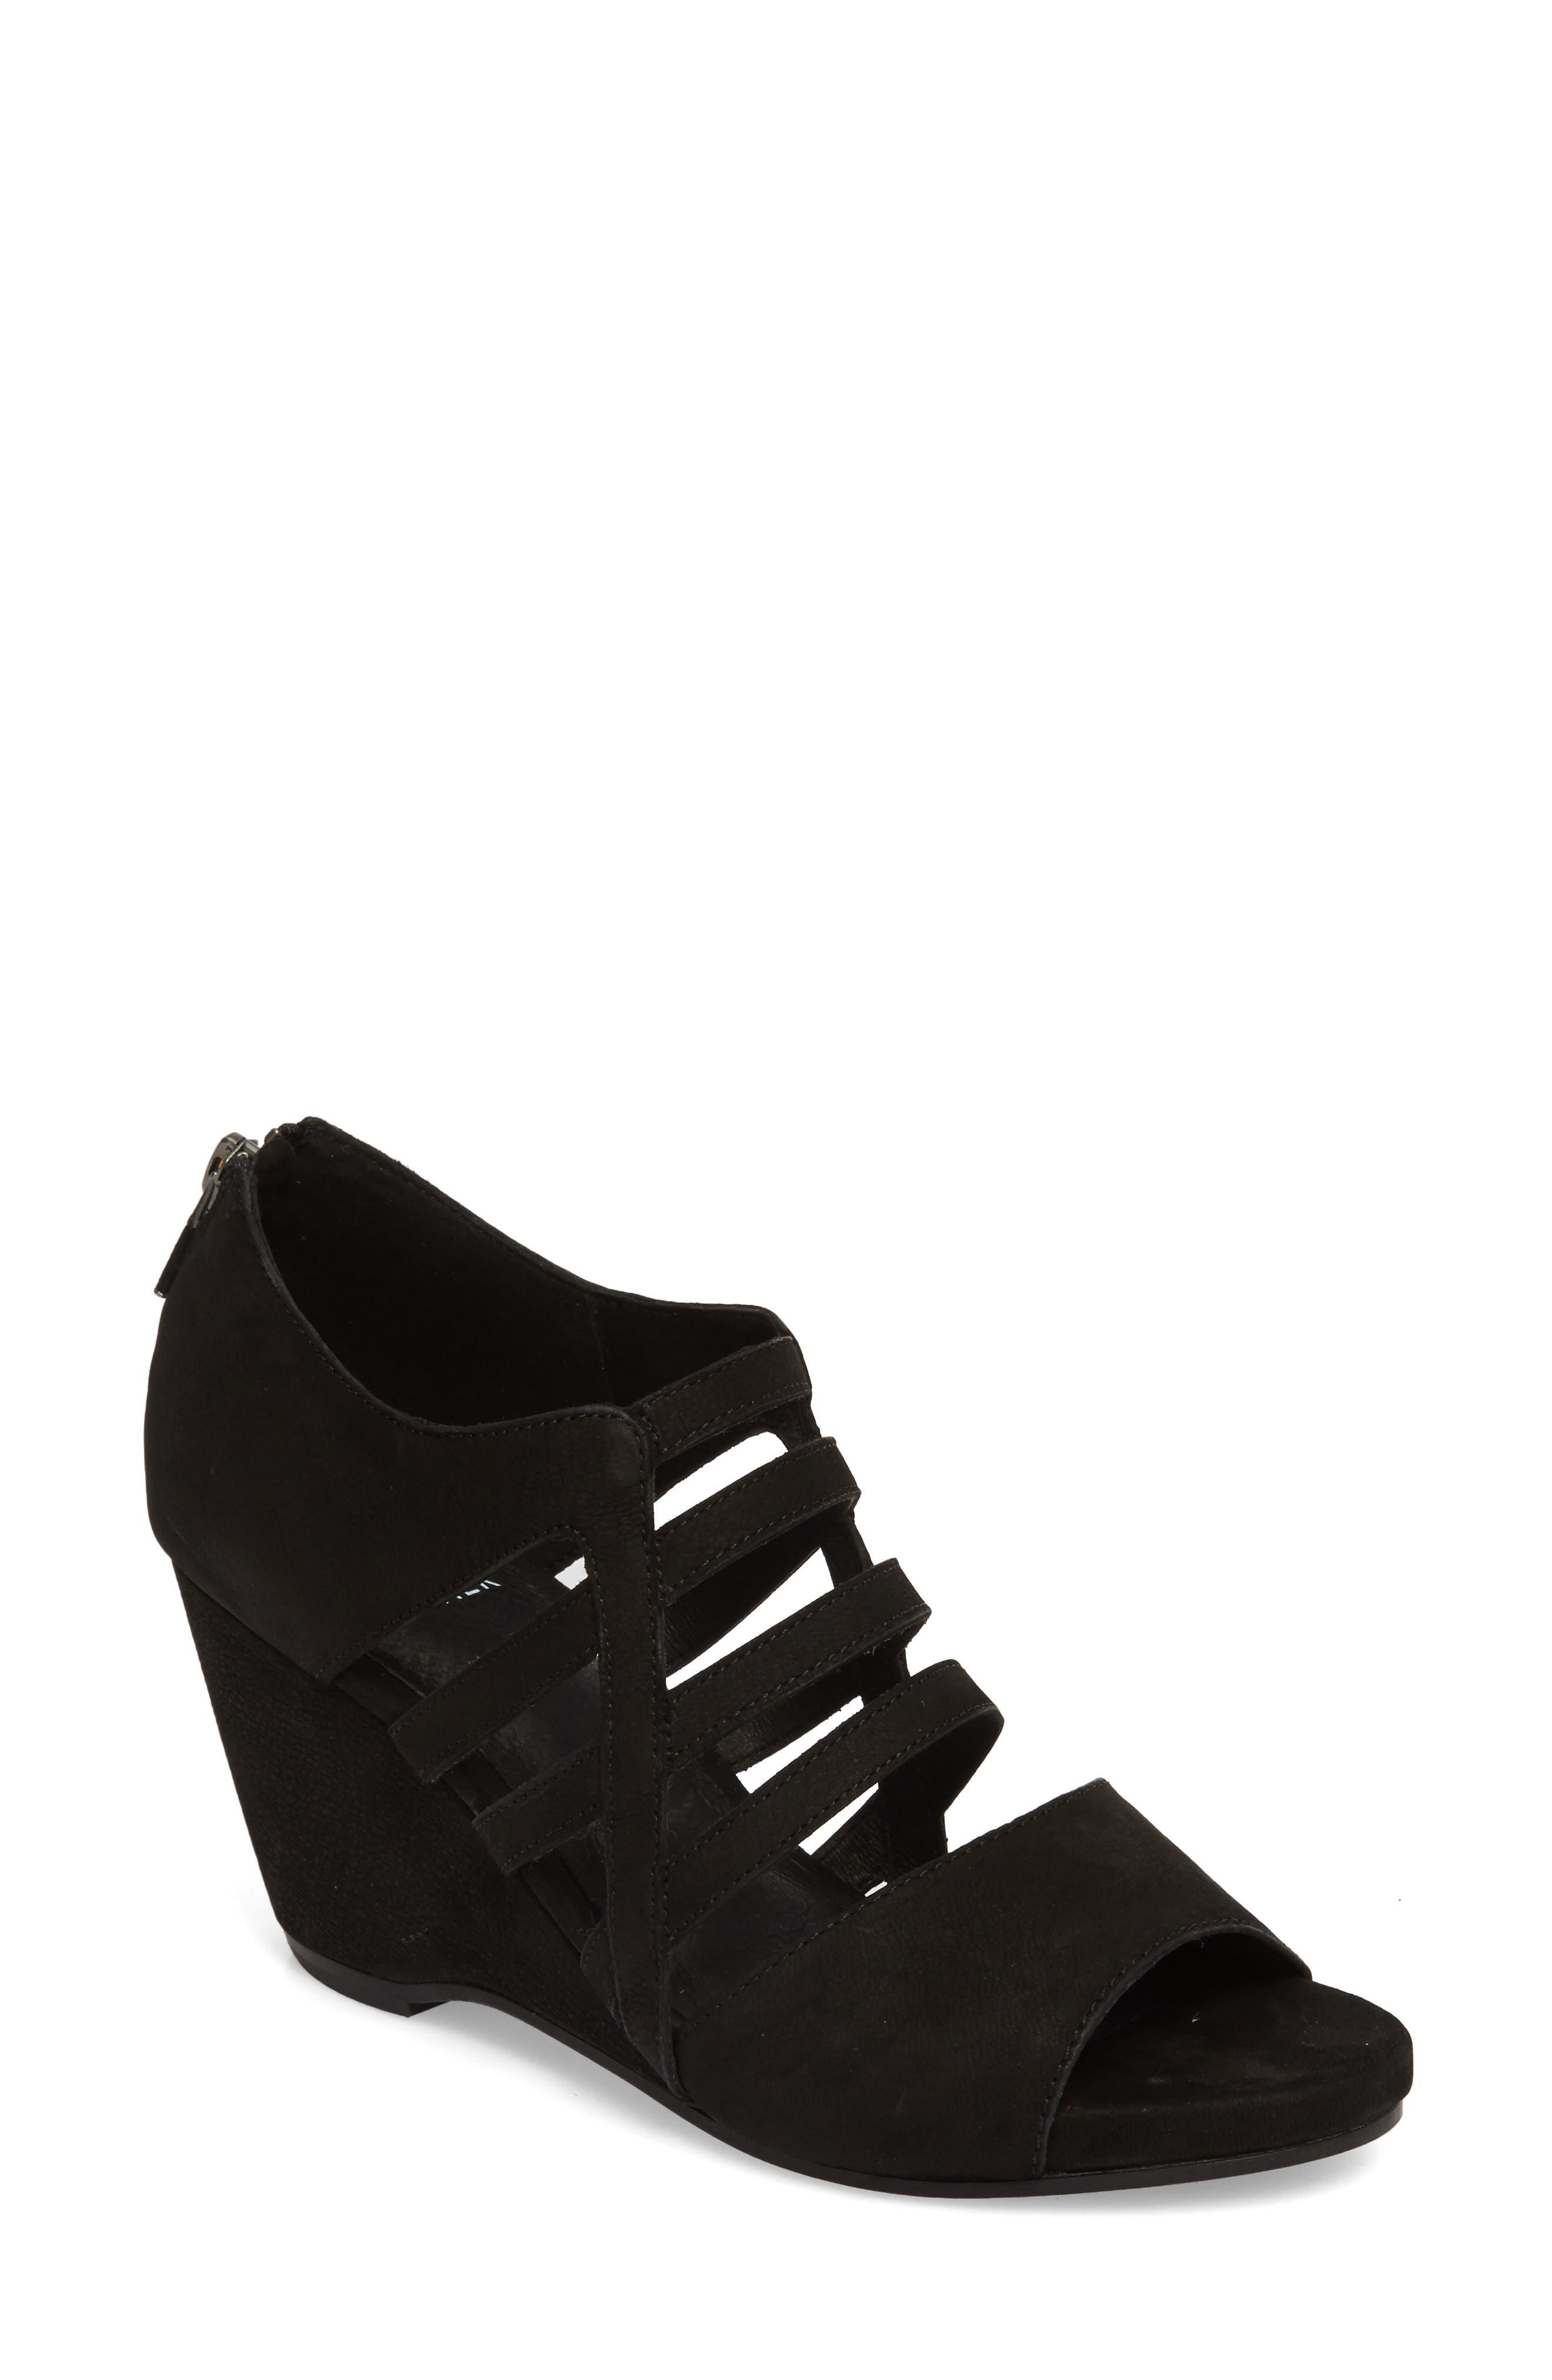 Dewey Wedge Sandal,                             Main thumbnail 1, color,                             Black Nubuck